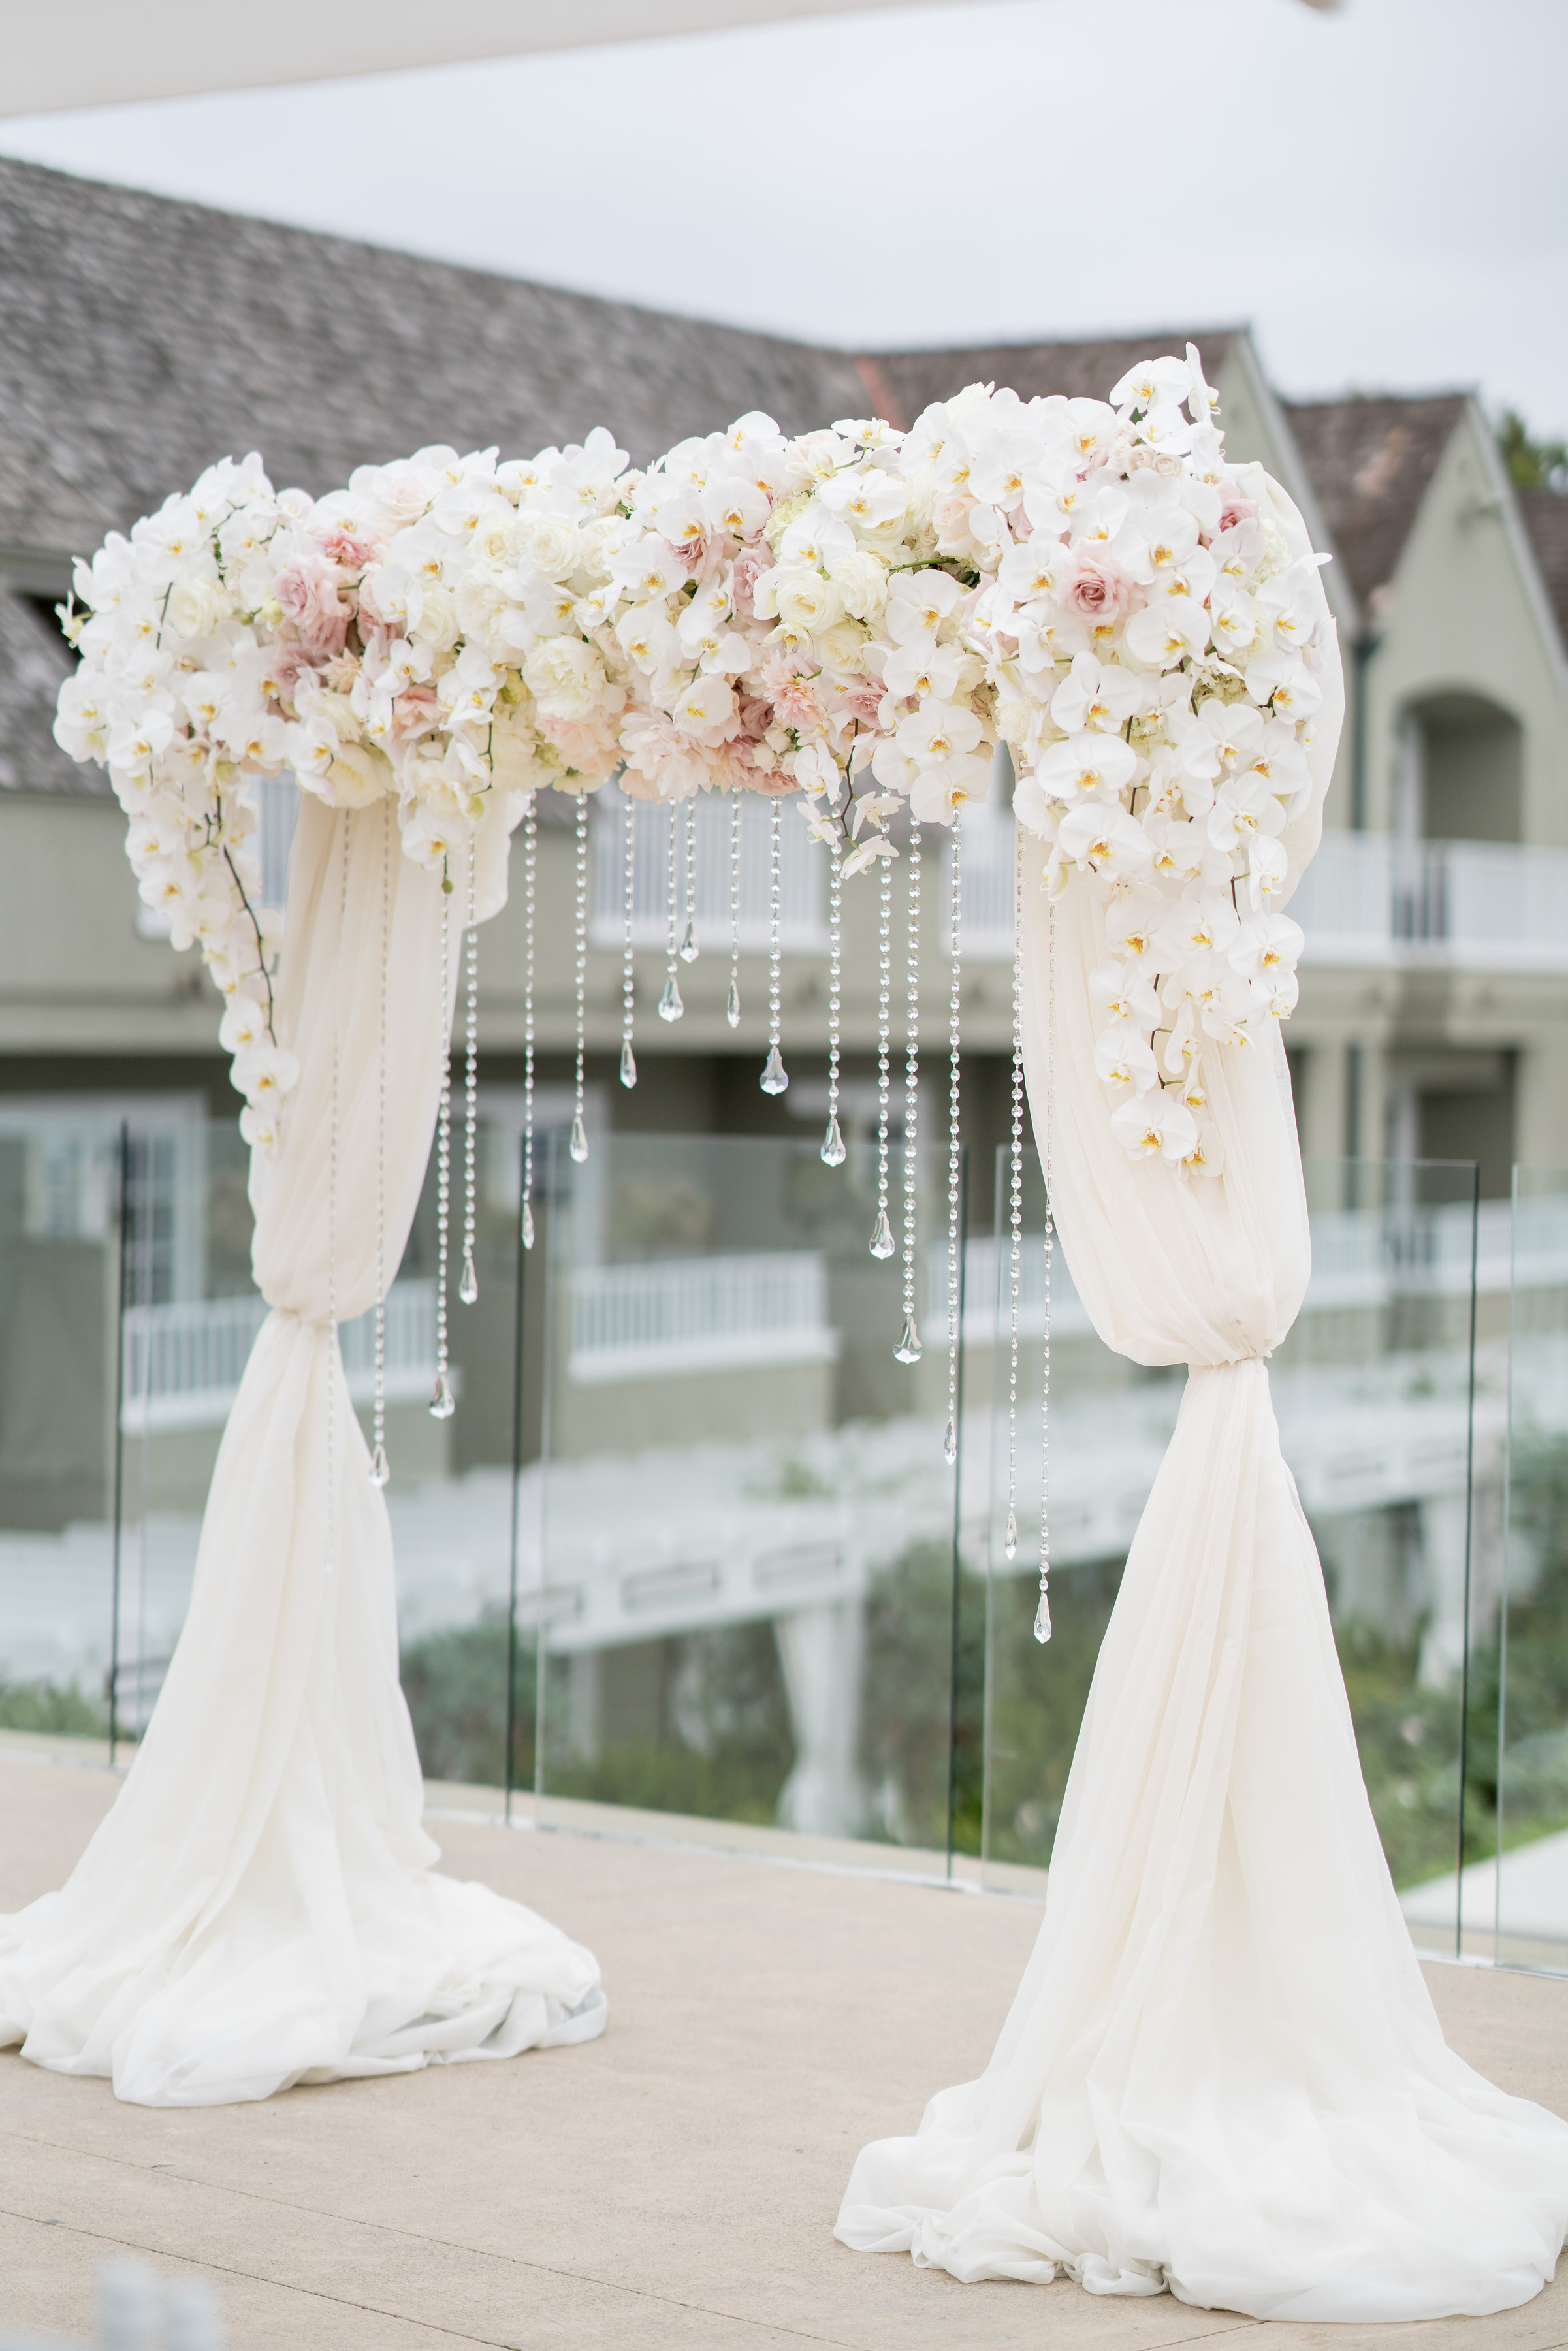 Melissa-Erik-Wedding-David-Manning-Photographer-160514-0270.jpg